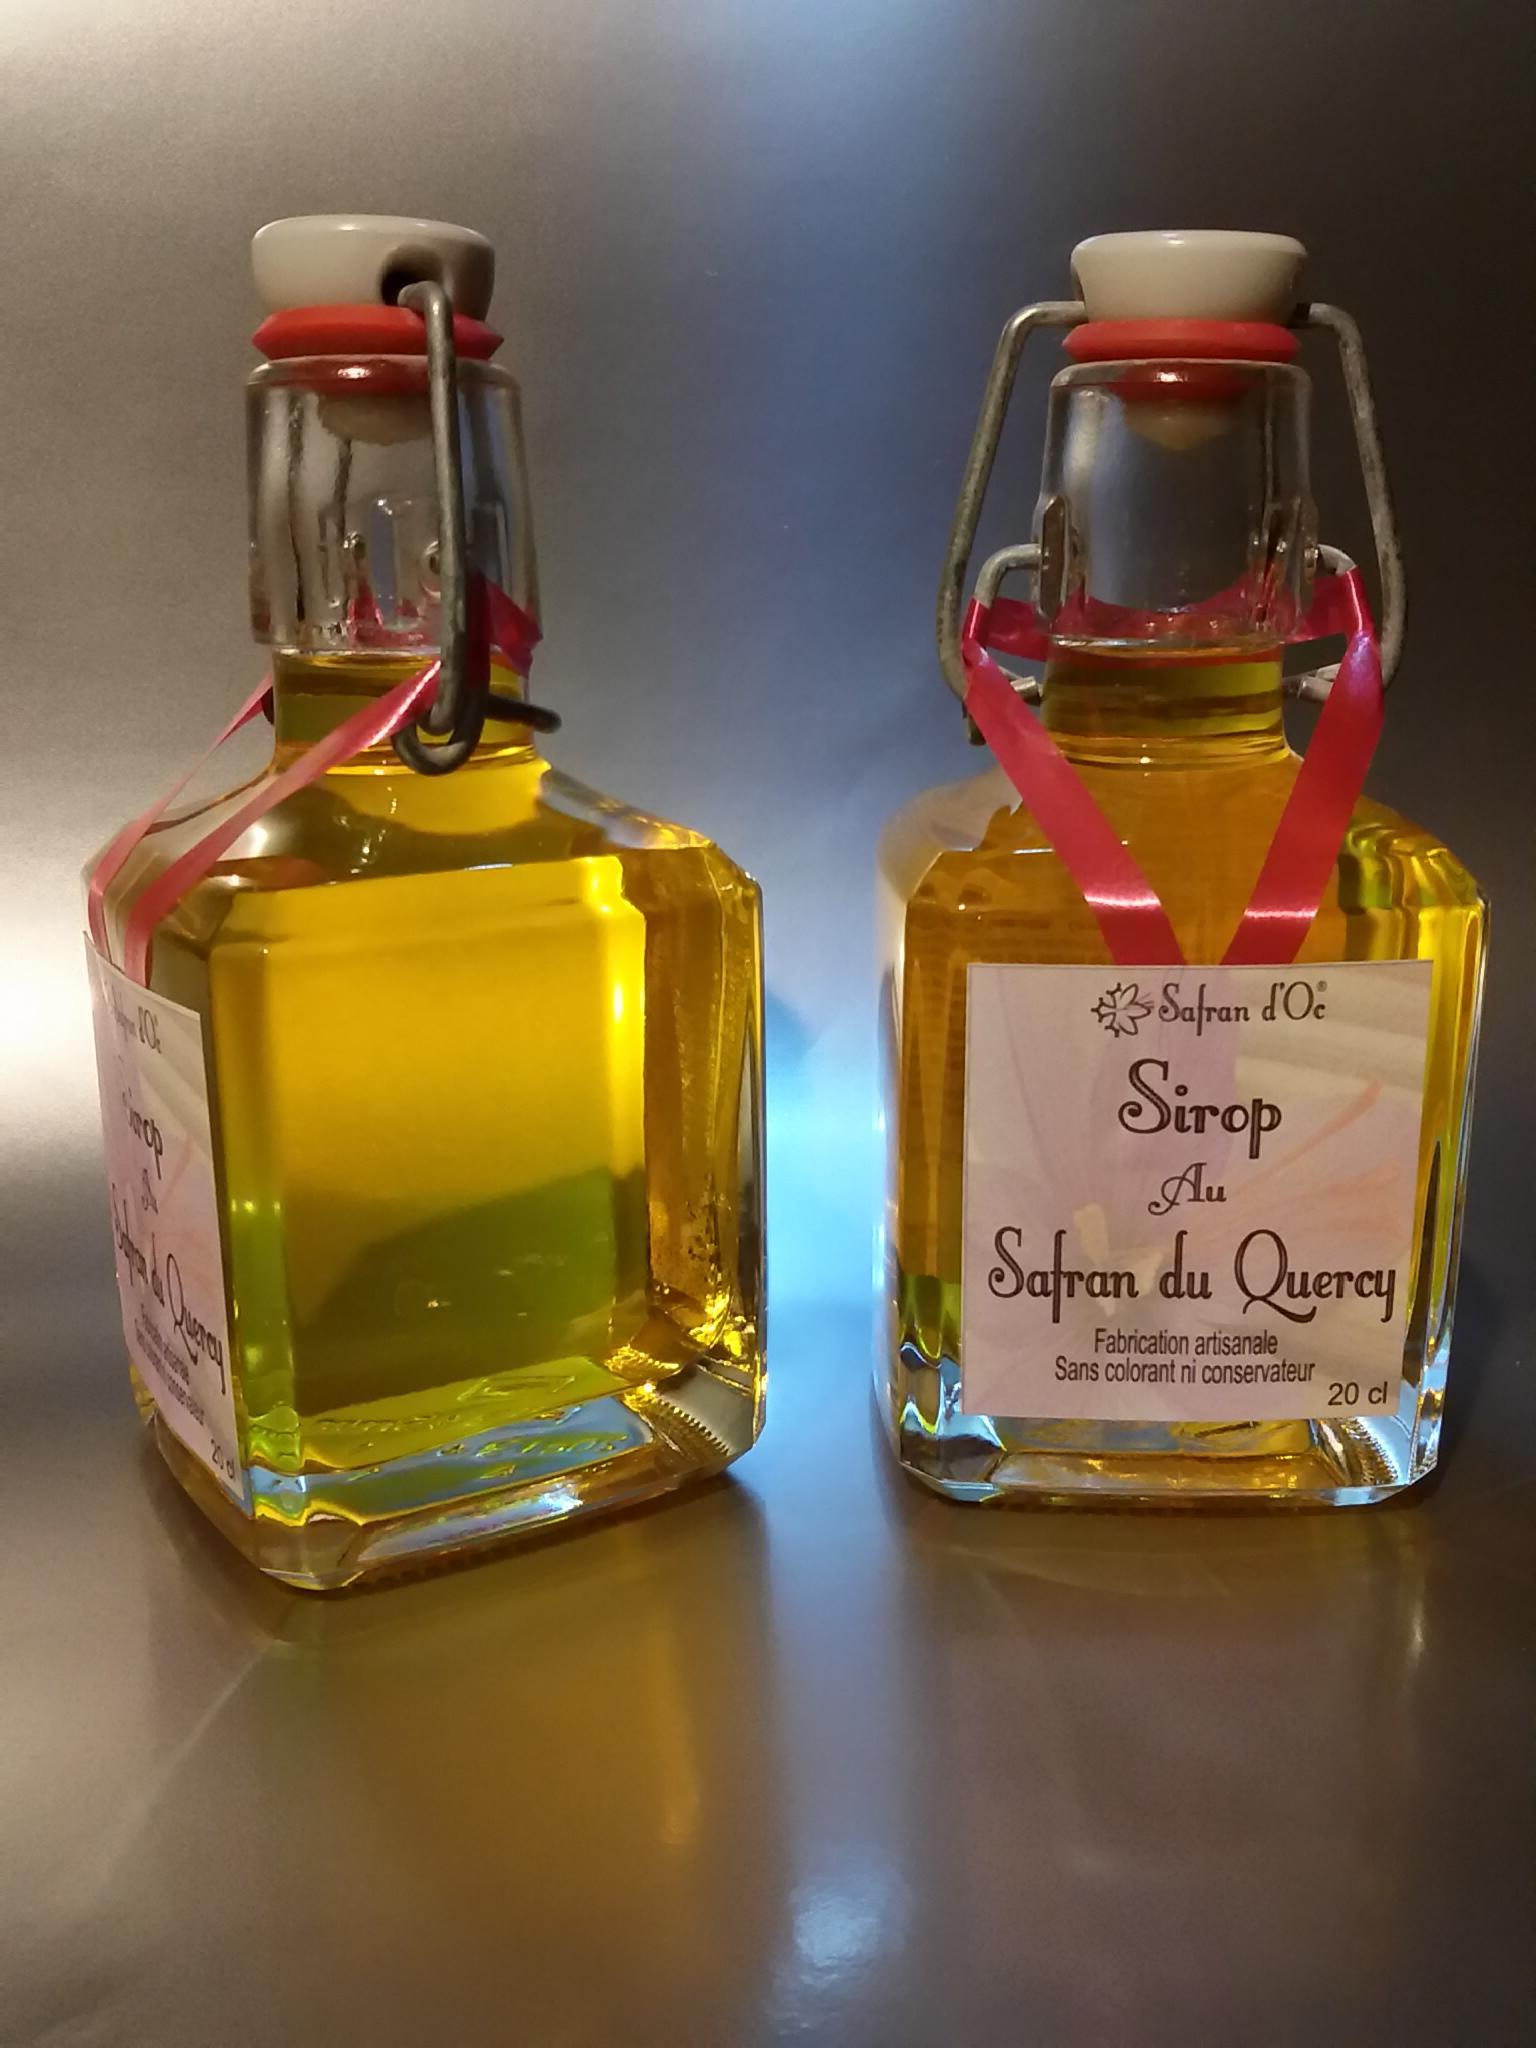 Sirop de safran - 20cl - Safran d'Oc